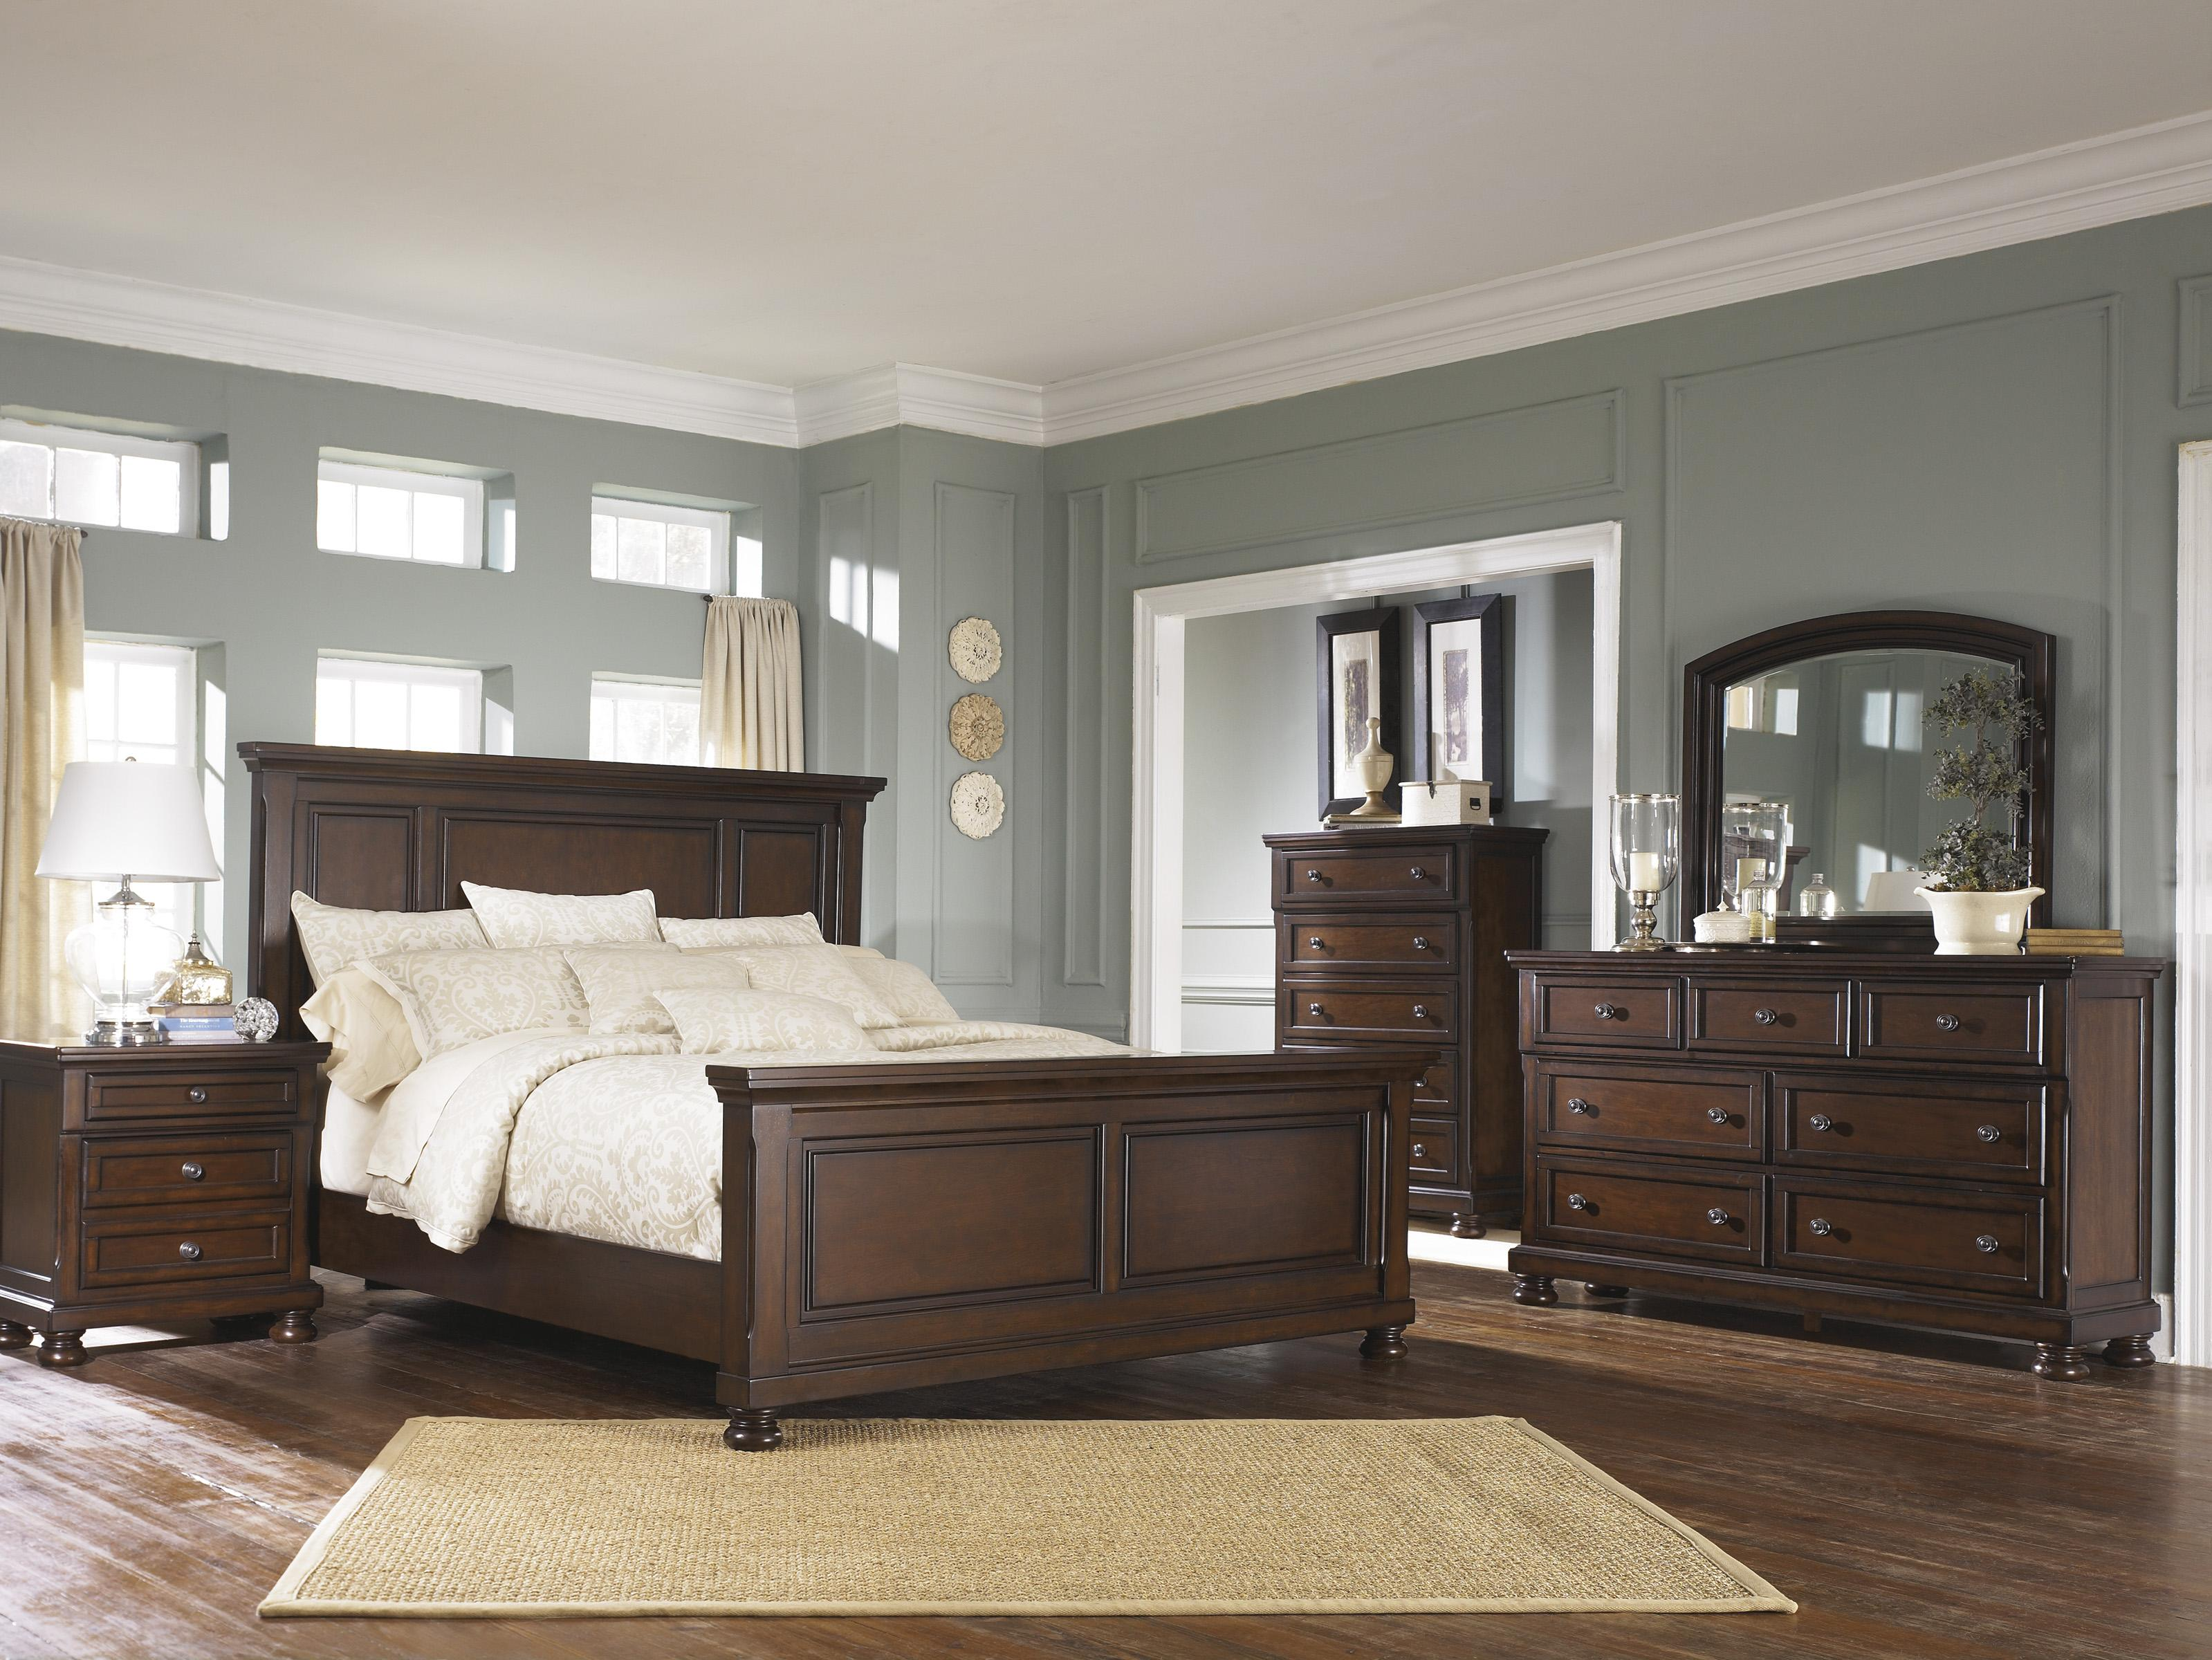 Ashley Furniture Porter Queen Bedroom Group Wayside